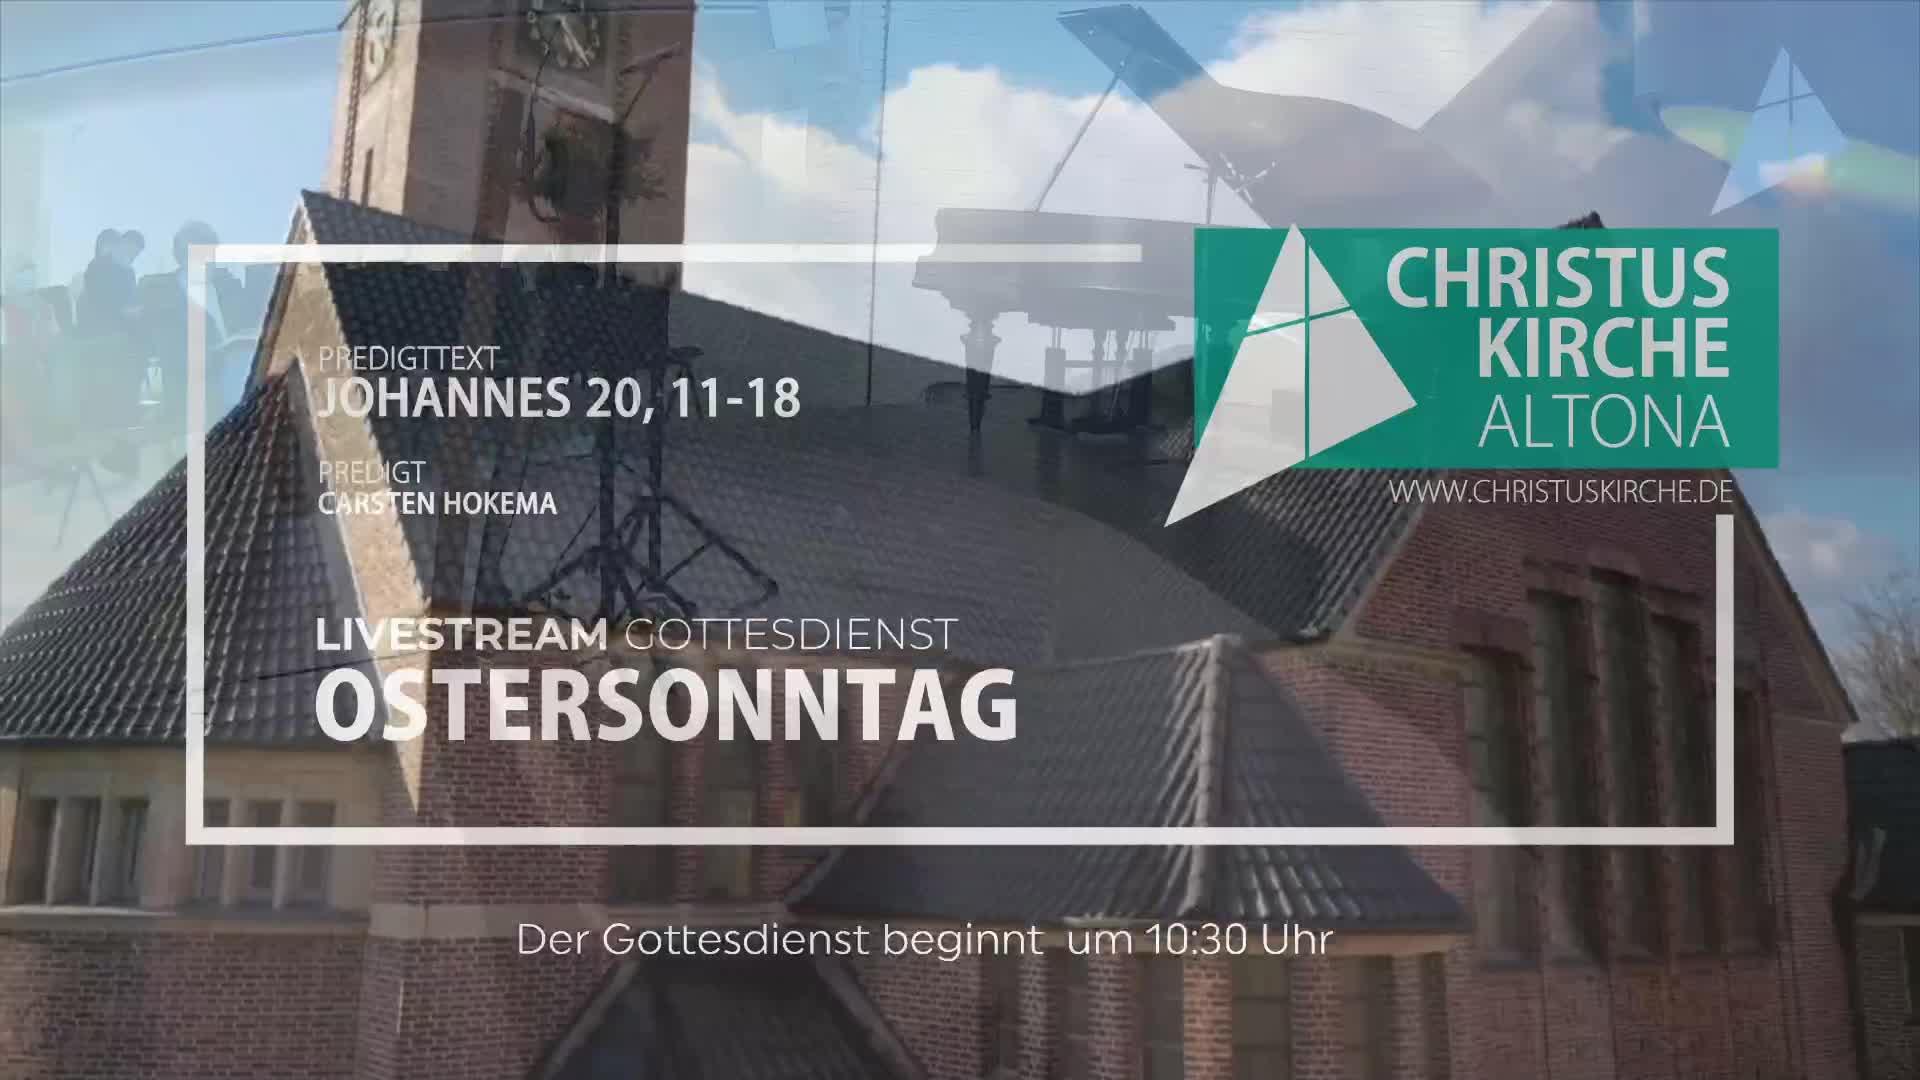 Ostersonntag - Gottestiens am 4. April - Livestream aus der Christuskirche Altona